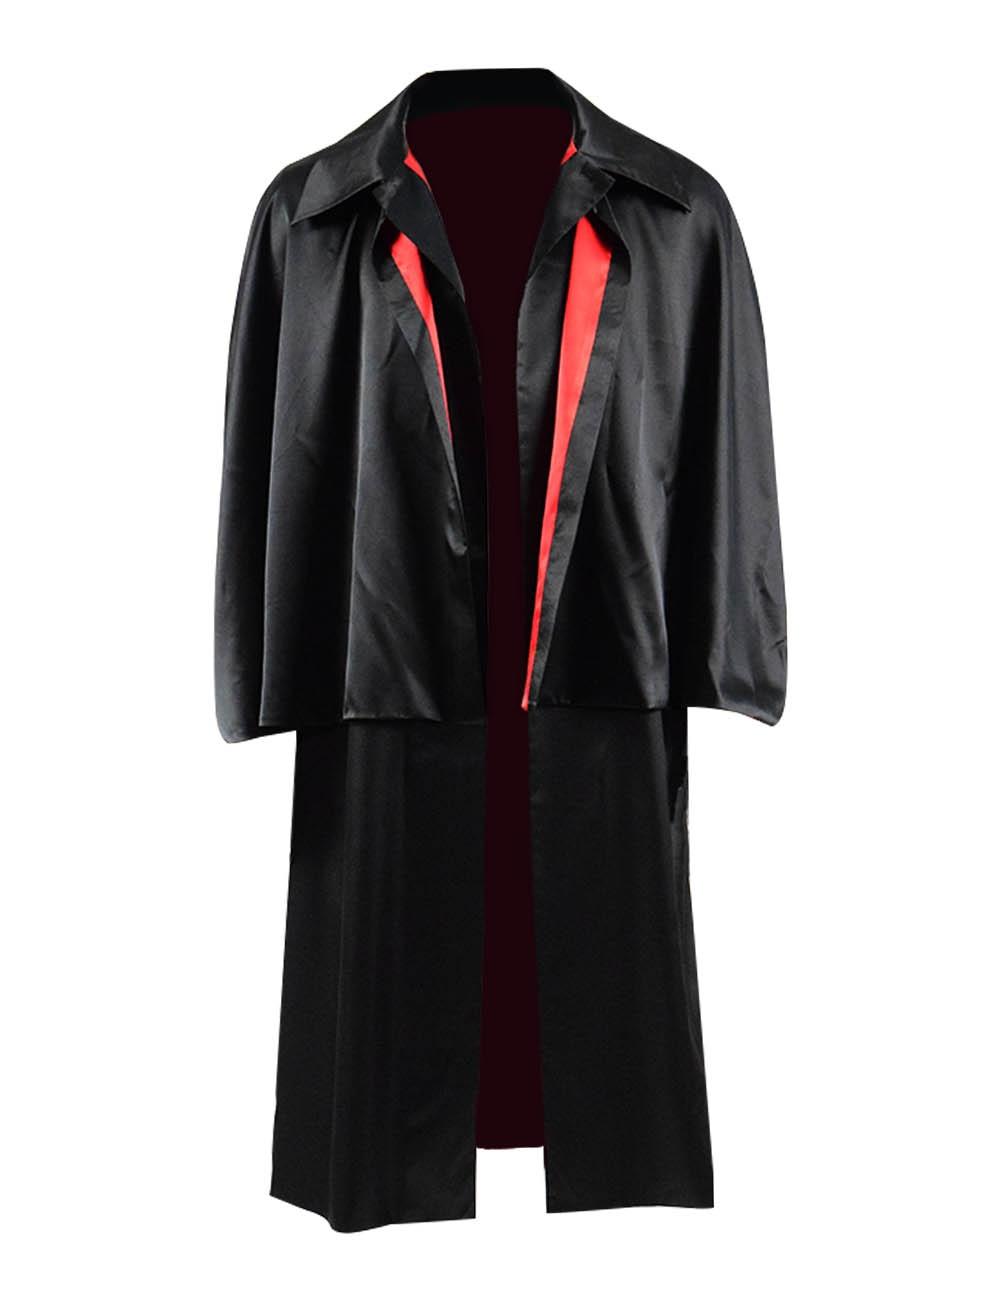 Historical Men's Cape Jacket Retro Cloak Victorian Dickens Coat Cosplay Costume